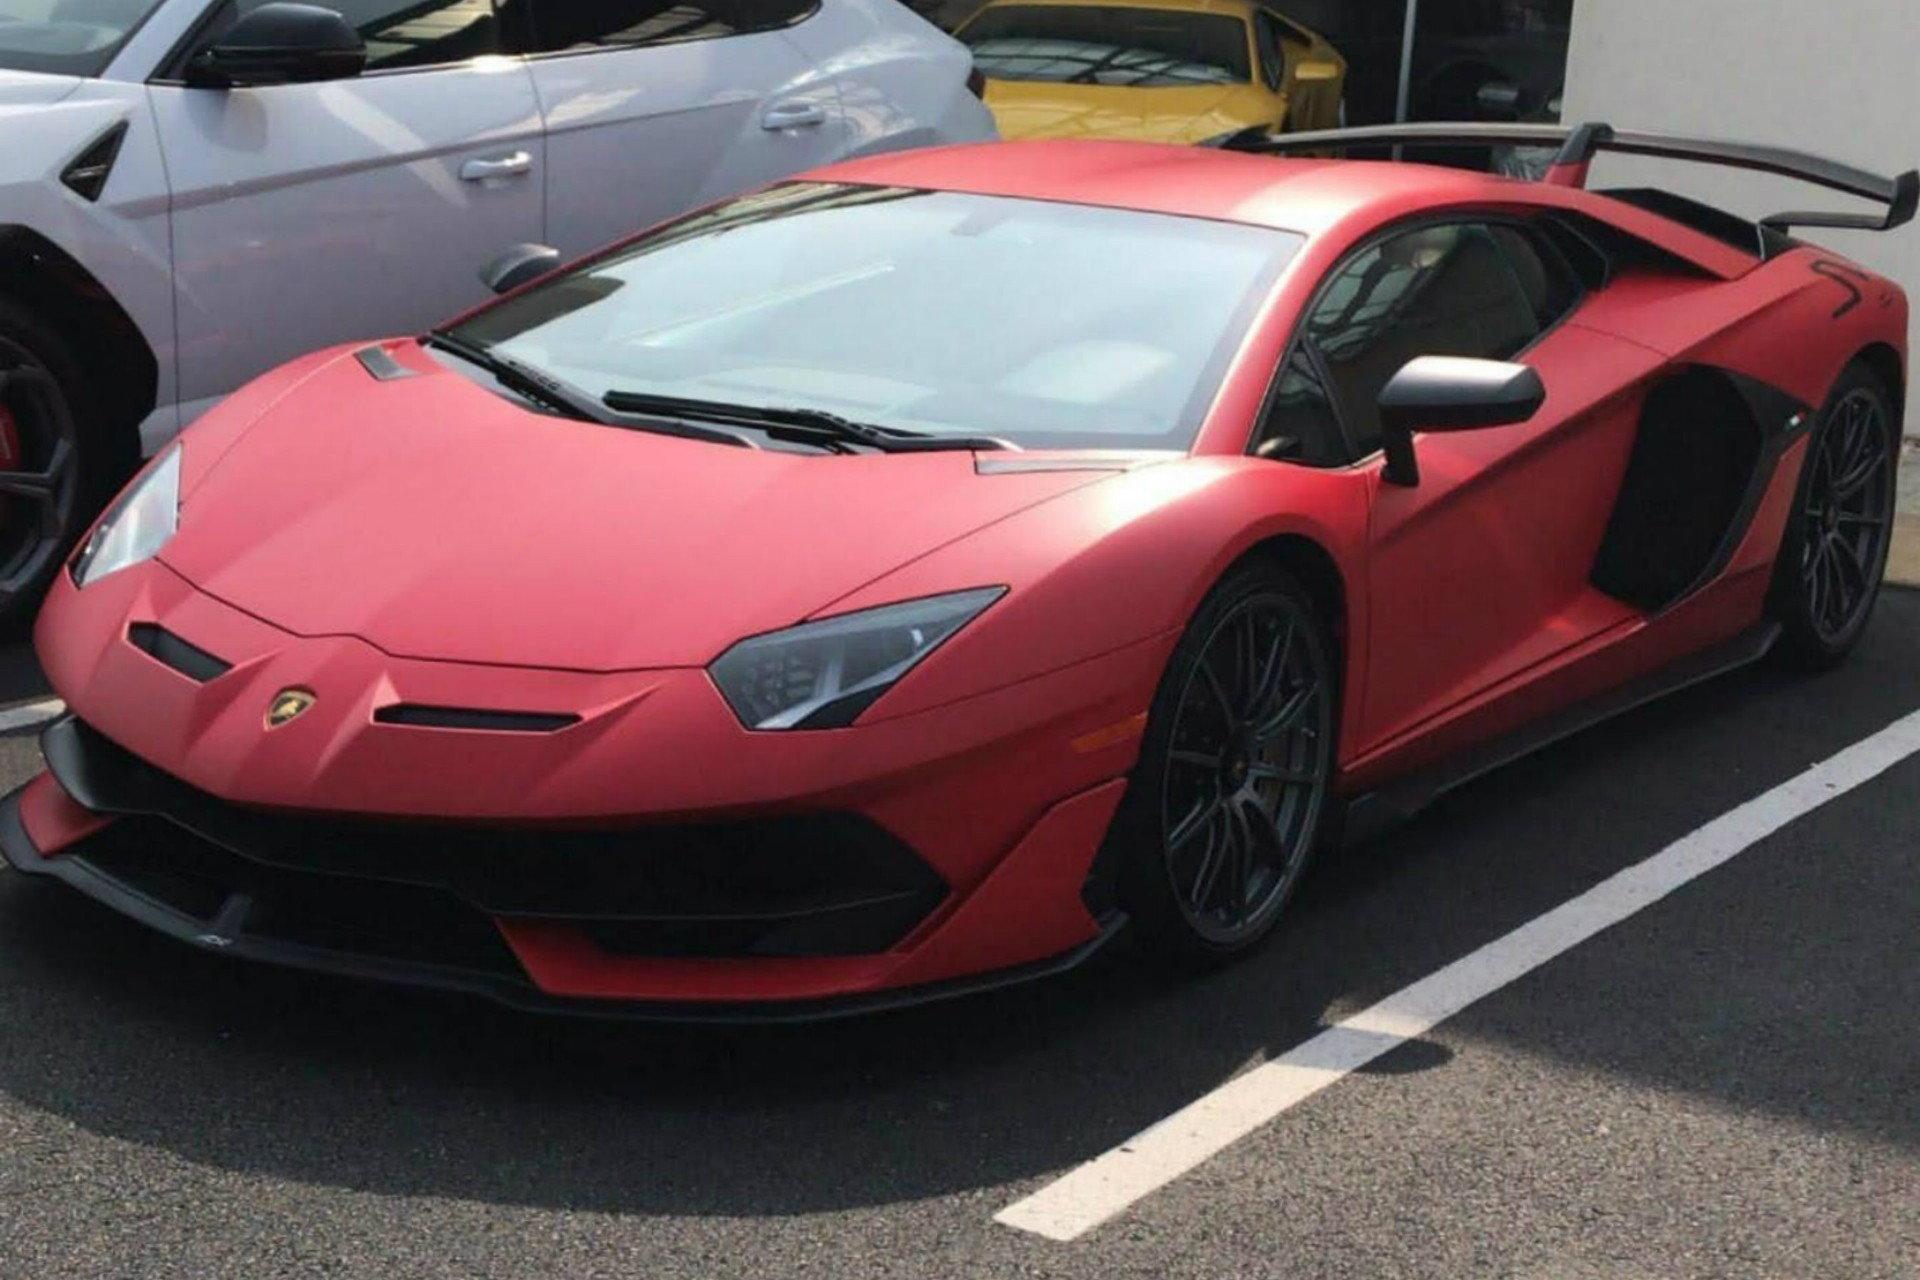 Matte Red Lamborghini Aventador Svj In Virginia 6speedonline Porsche Forum And Luxury Car Resource